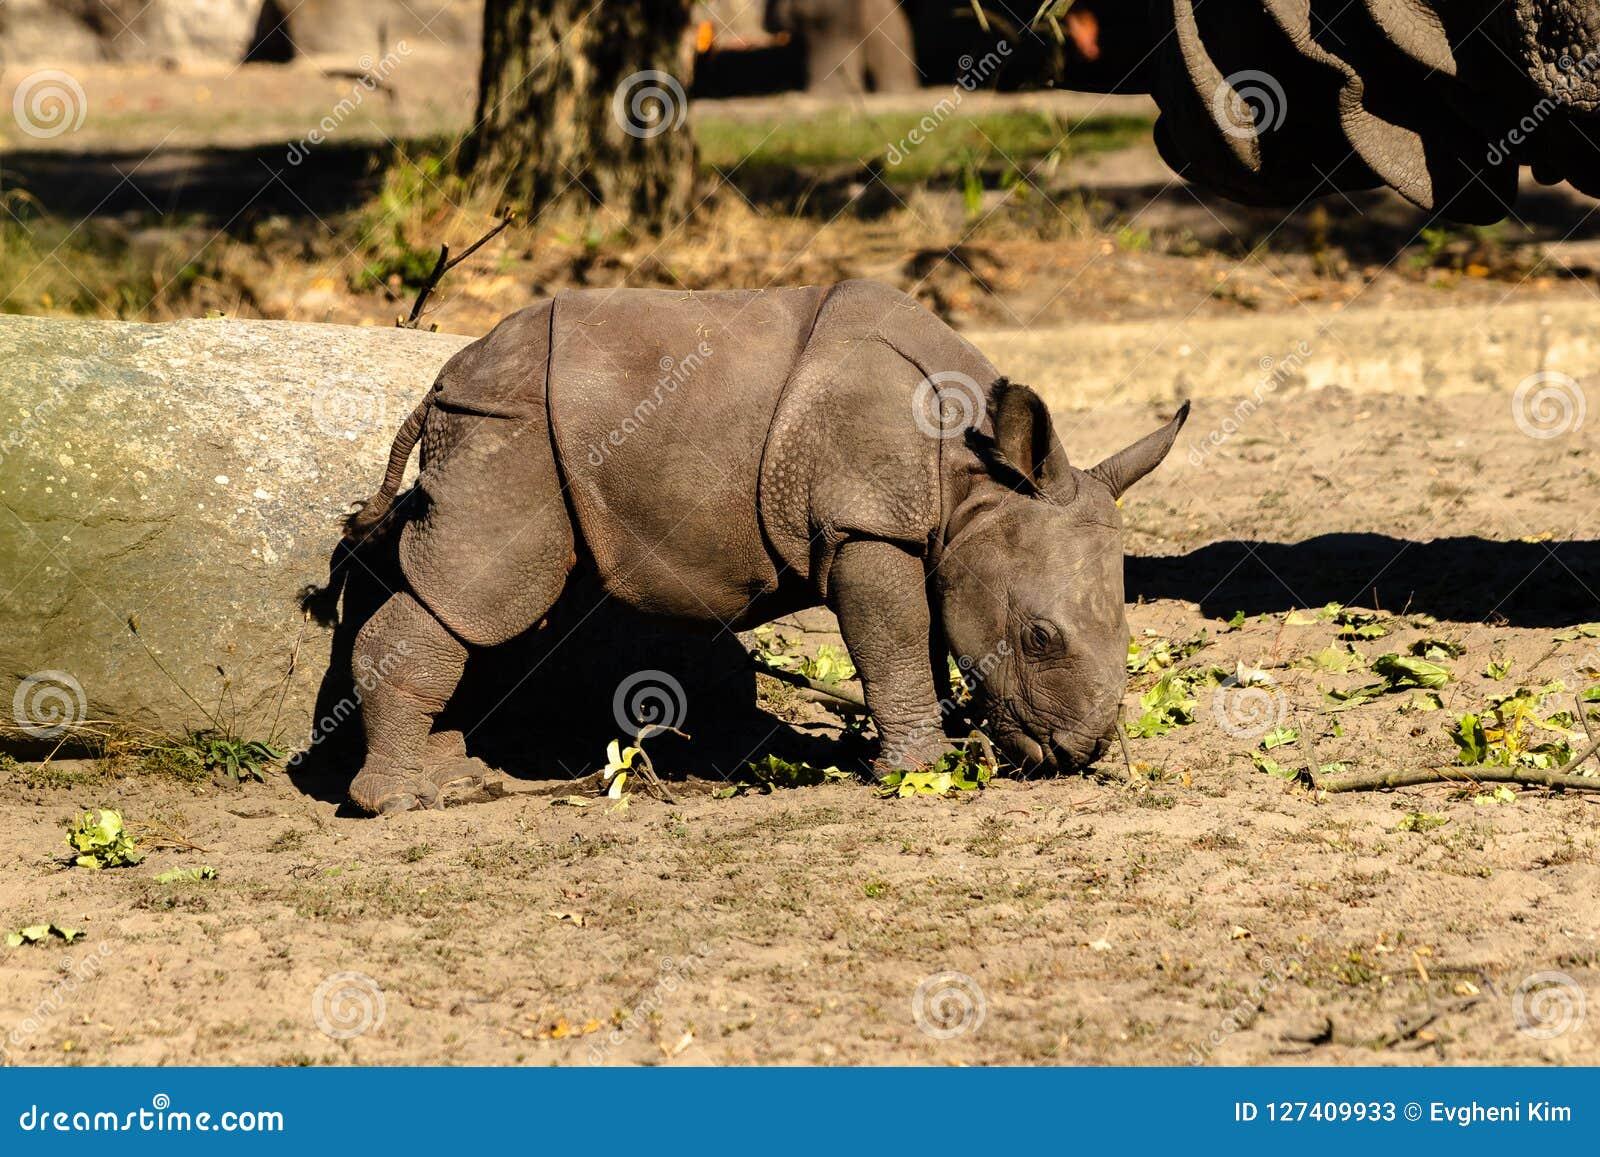 A newborn baby Rhino at the zoo.